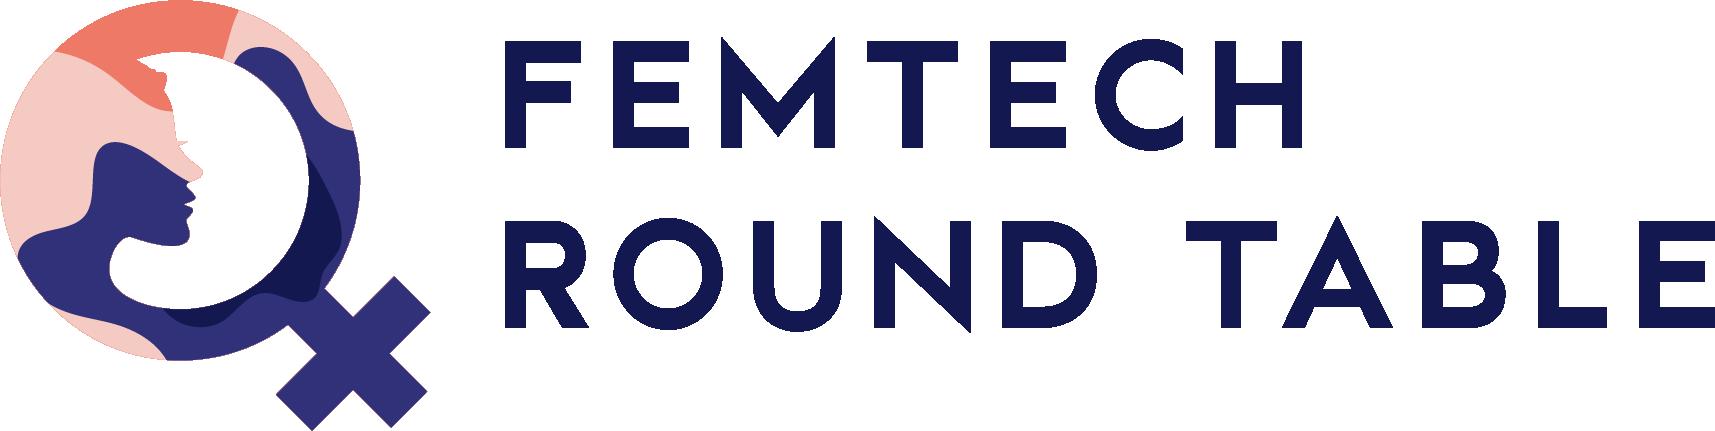 Femtech Round Table